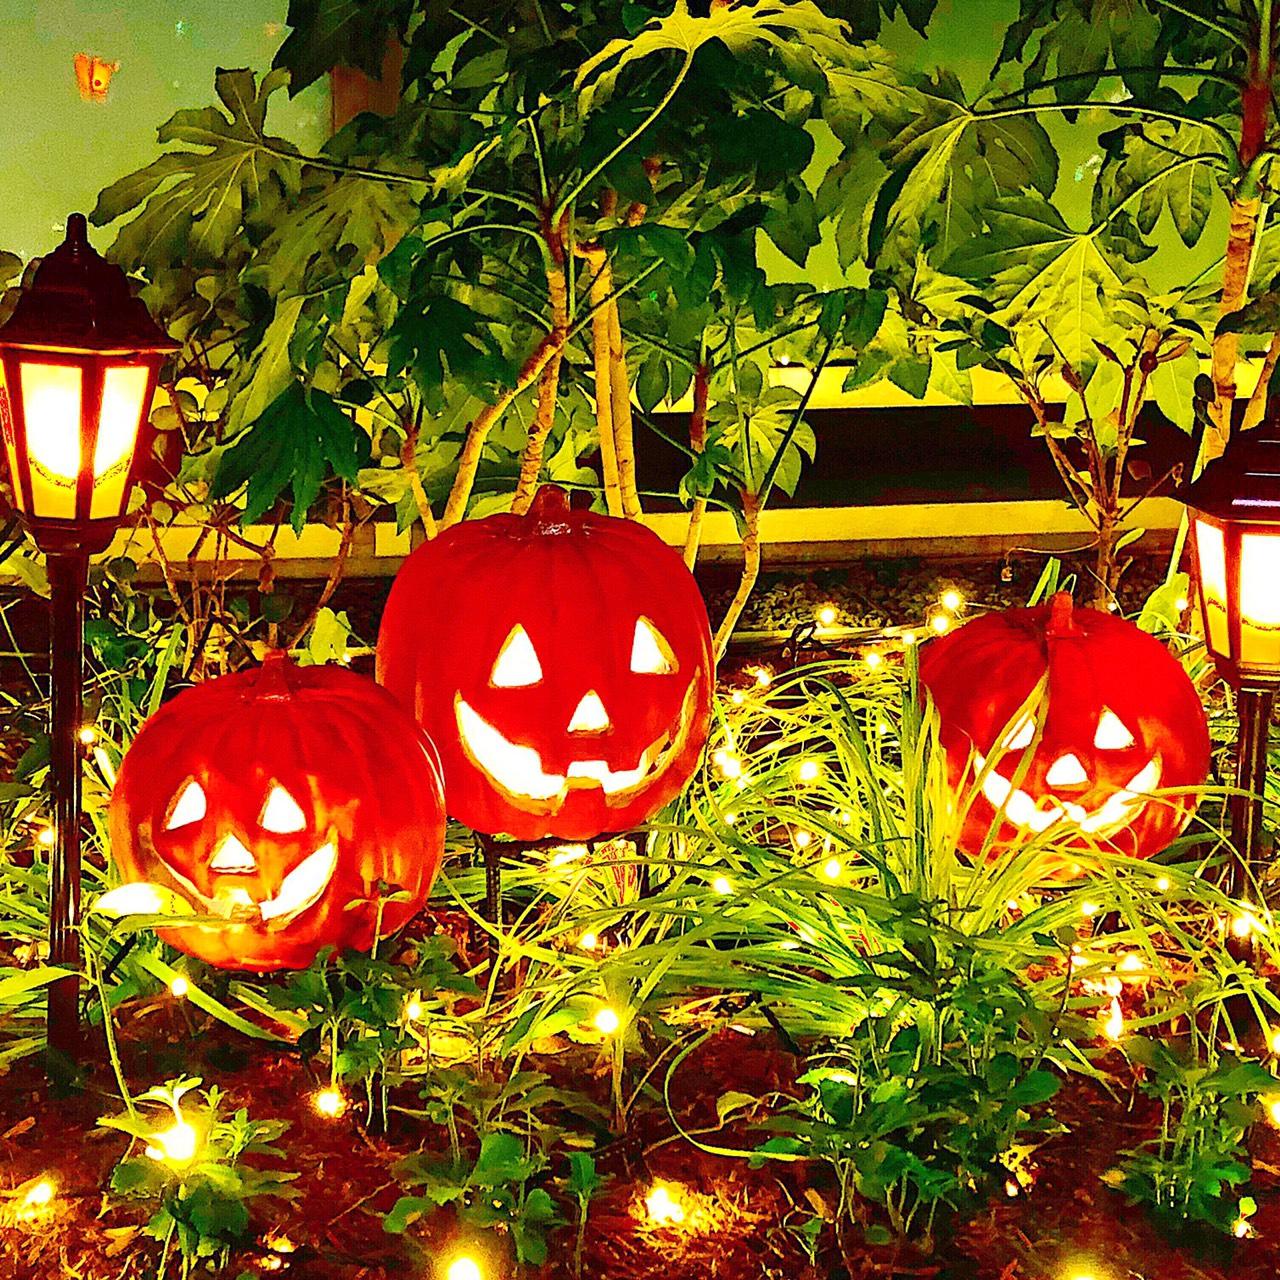 ��Happy Halloween ��